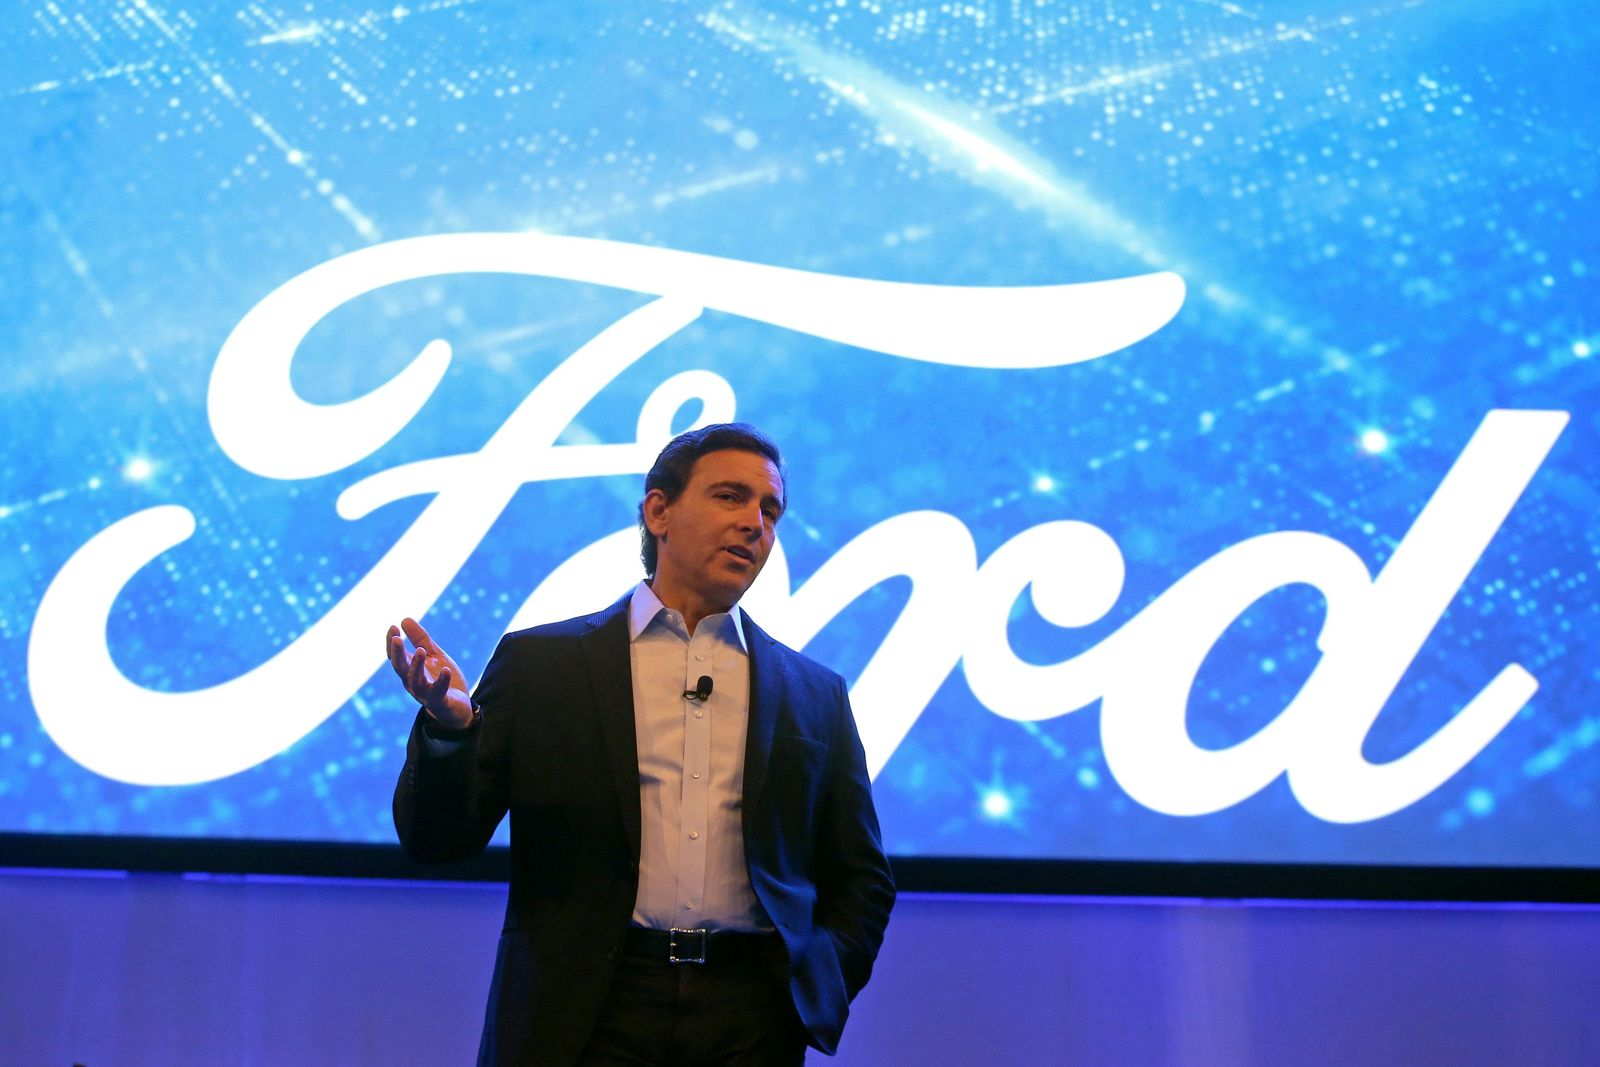 Ford / Mark Fields